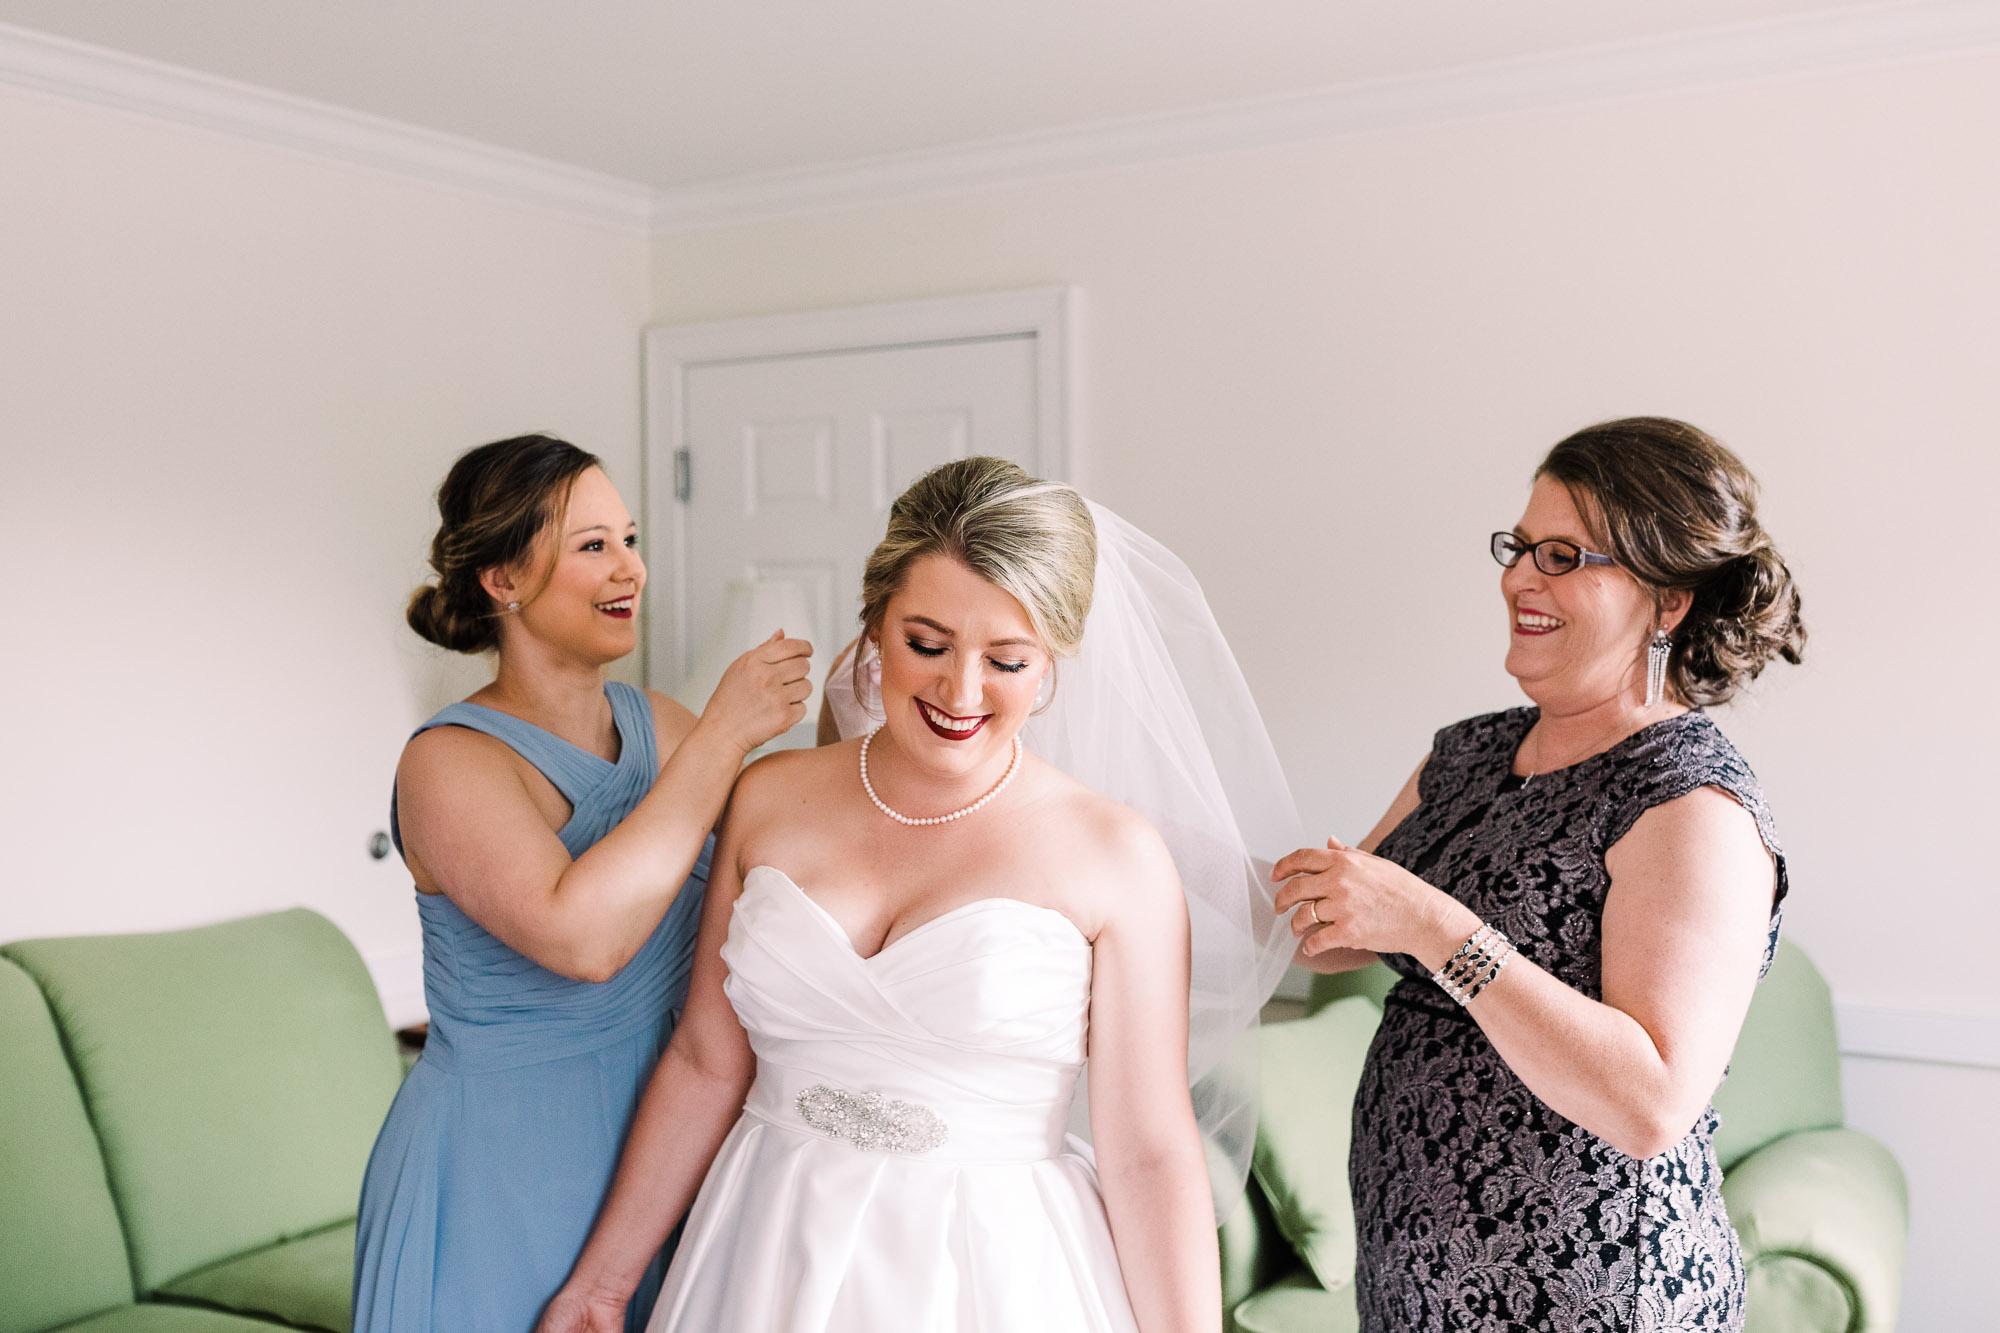 isle-of-que-wedding-6525.jpg